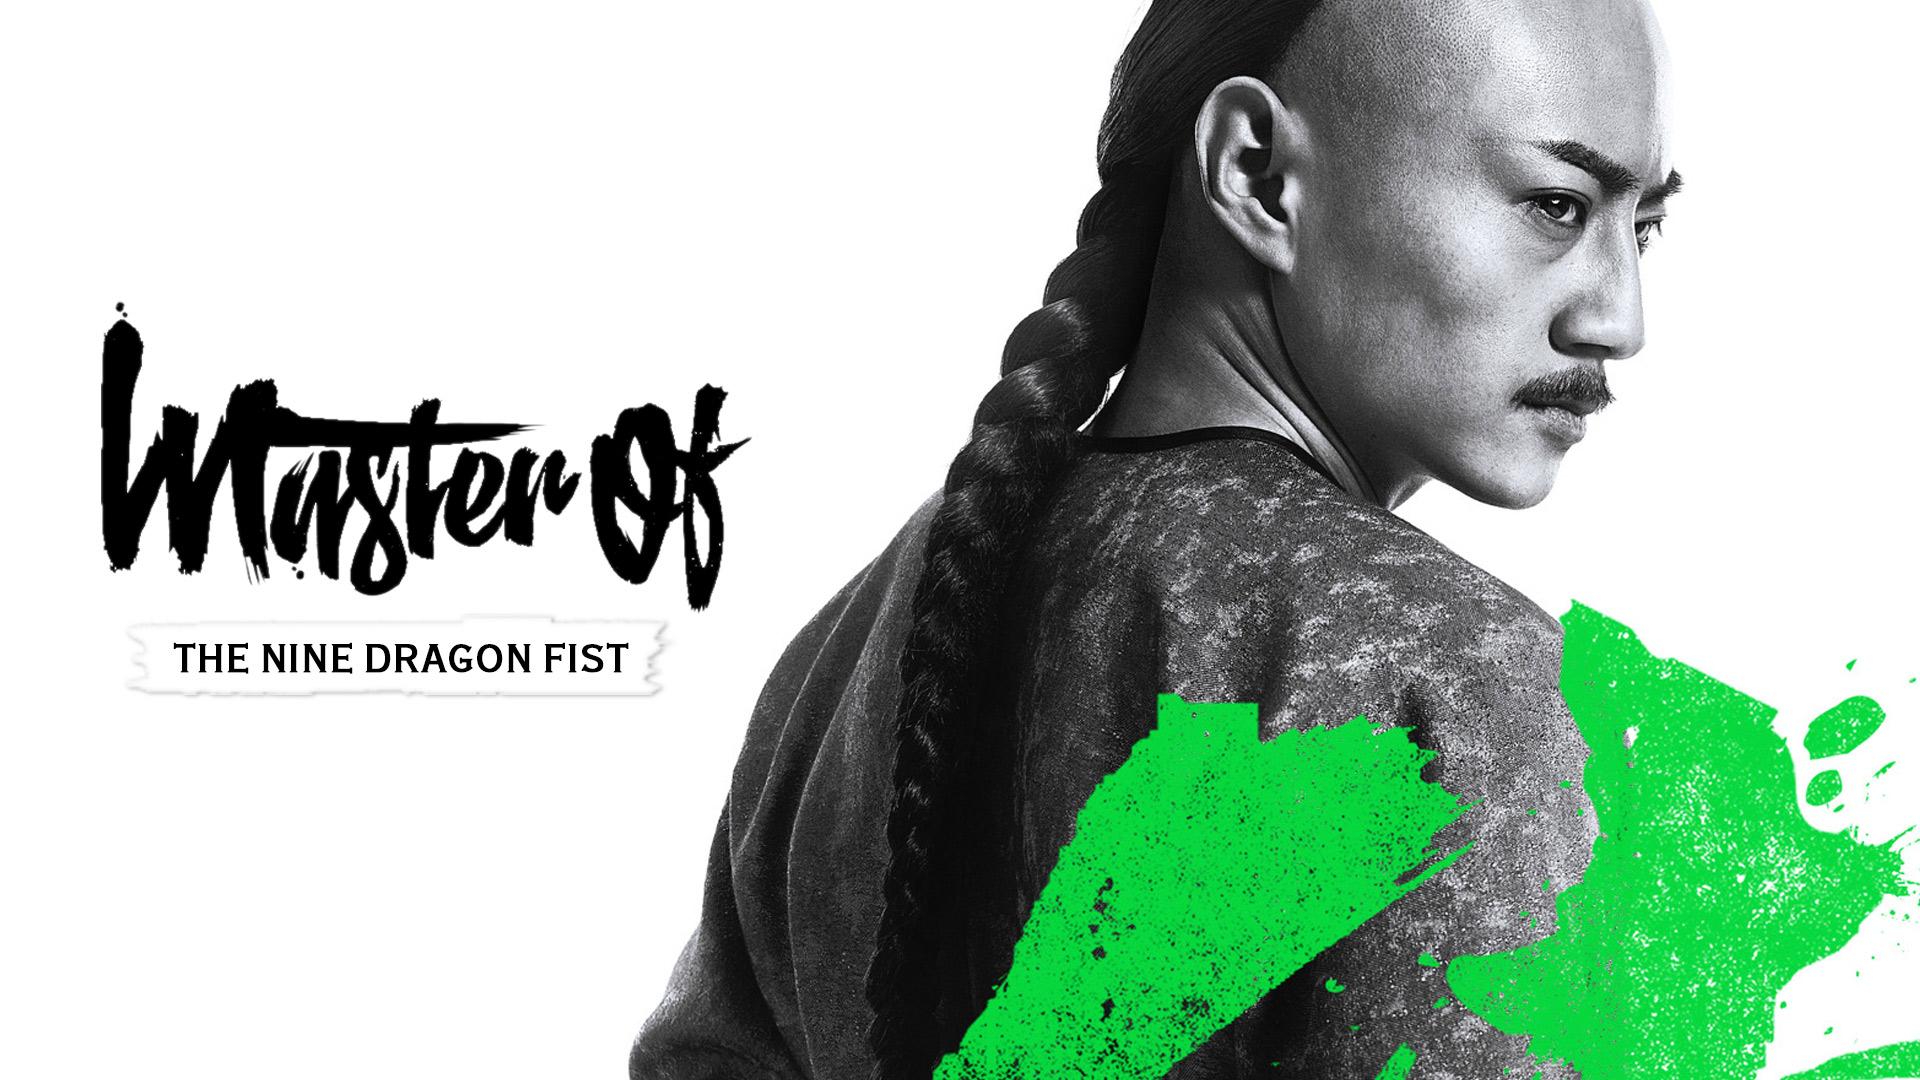 Master of Nine Dragon Fist